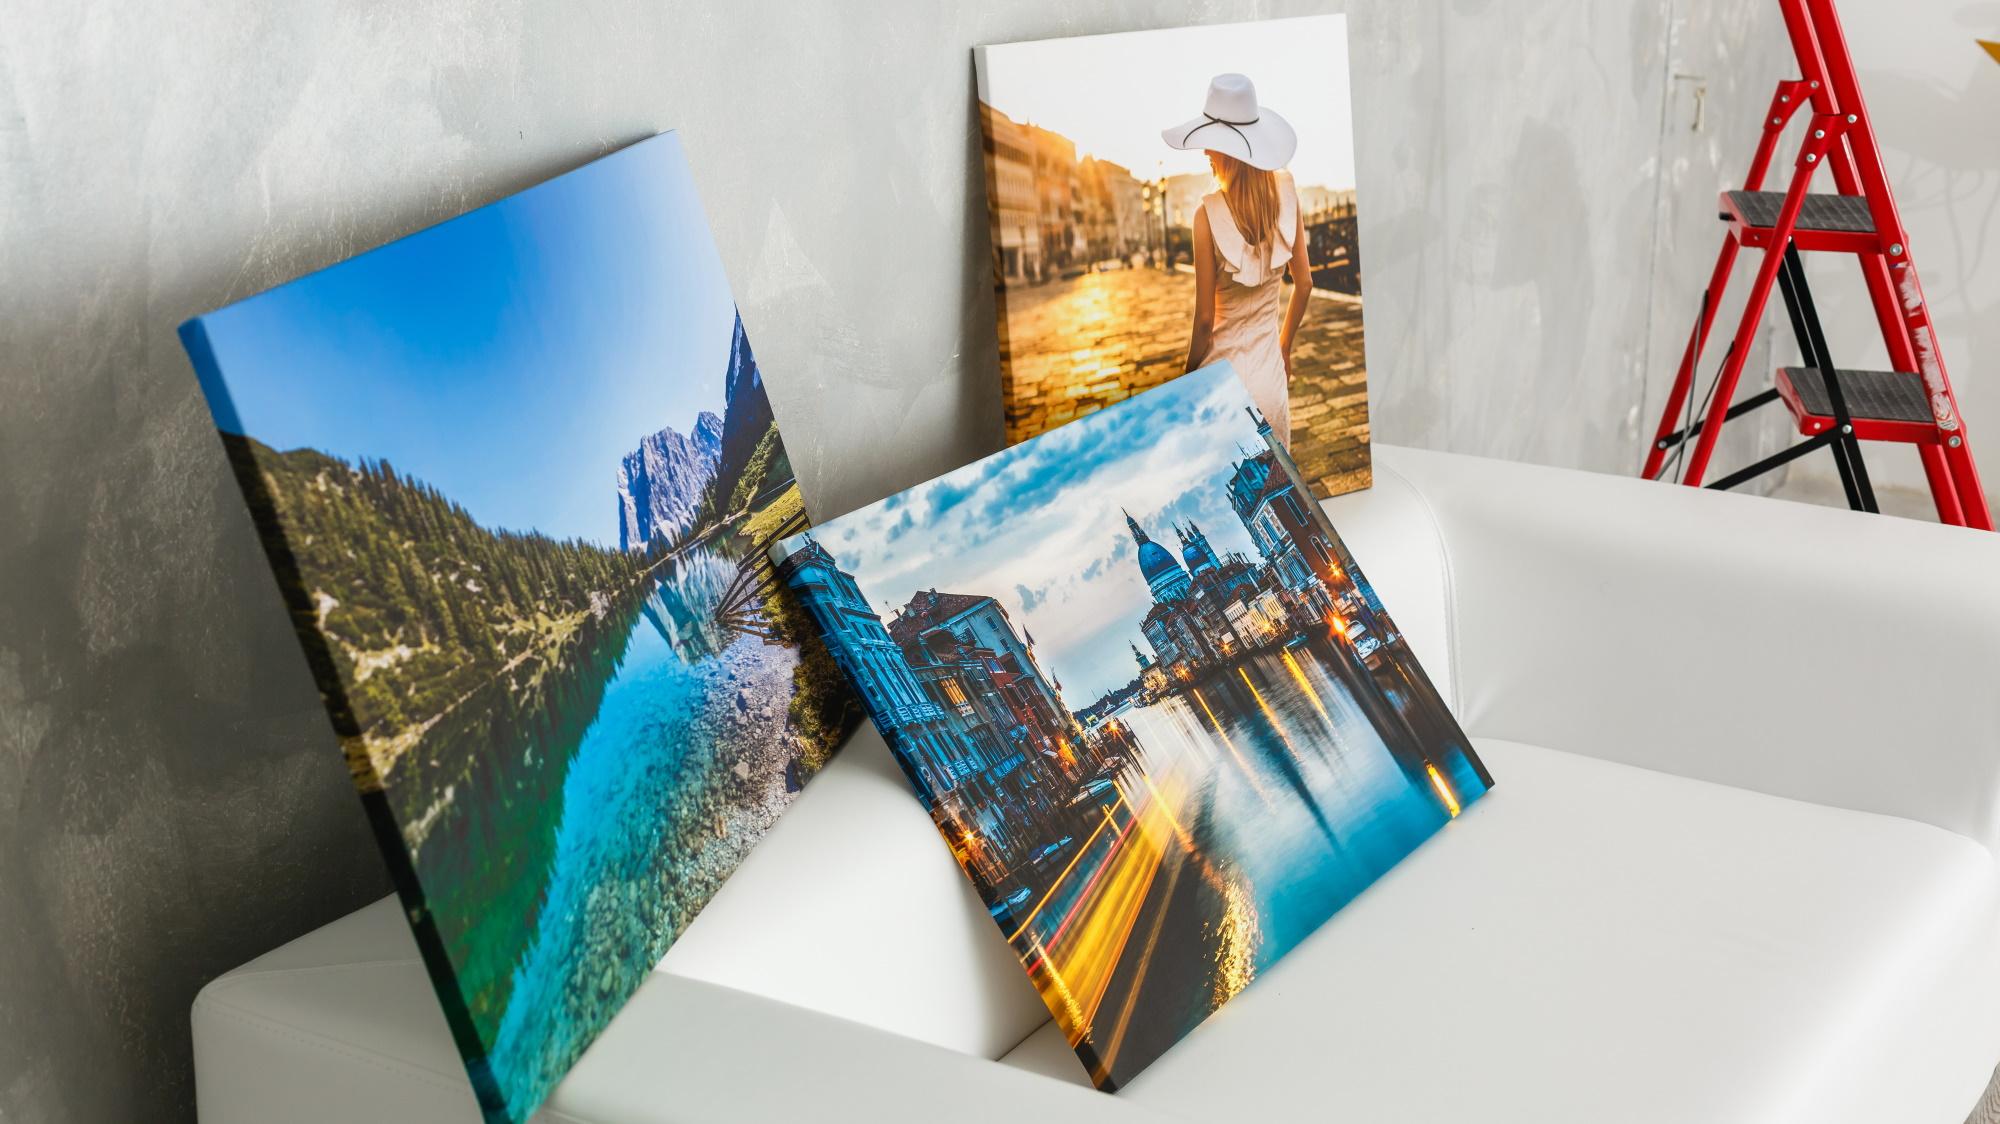 The best canvas print services online 2020 | TechRadar